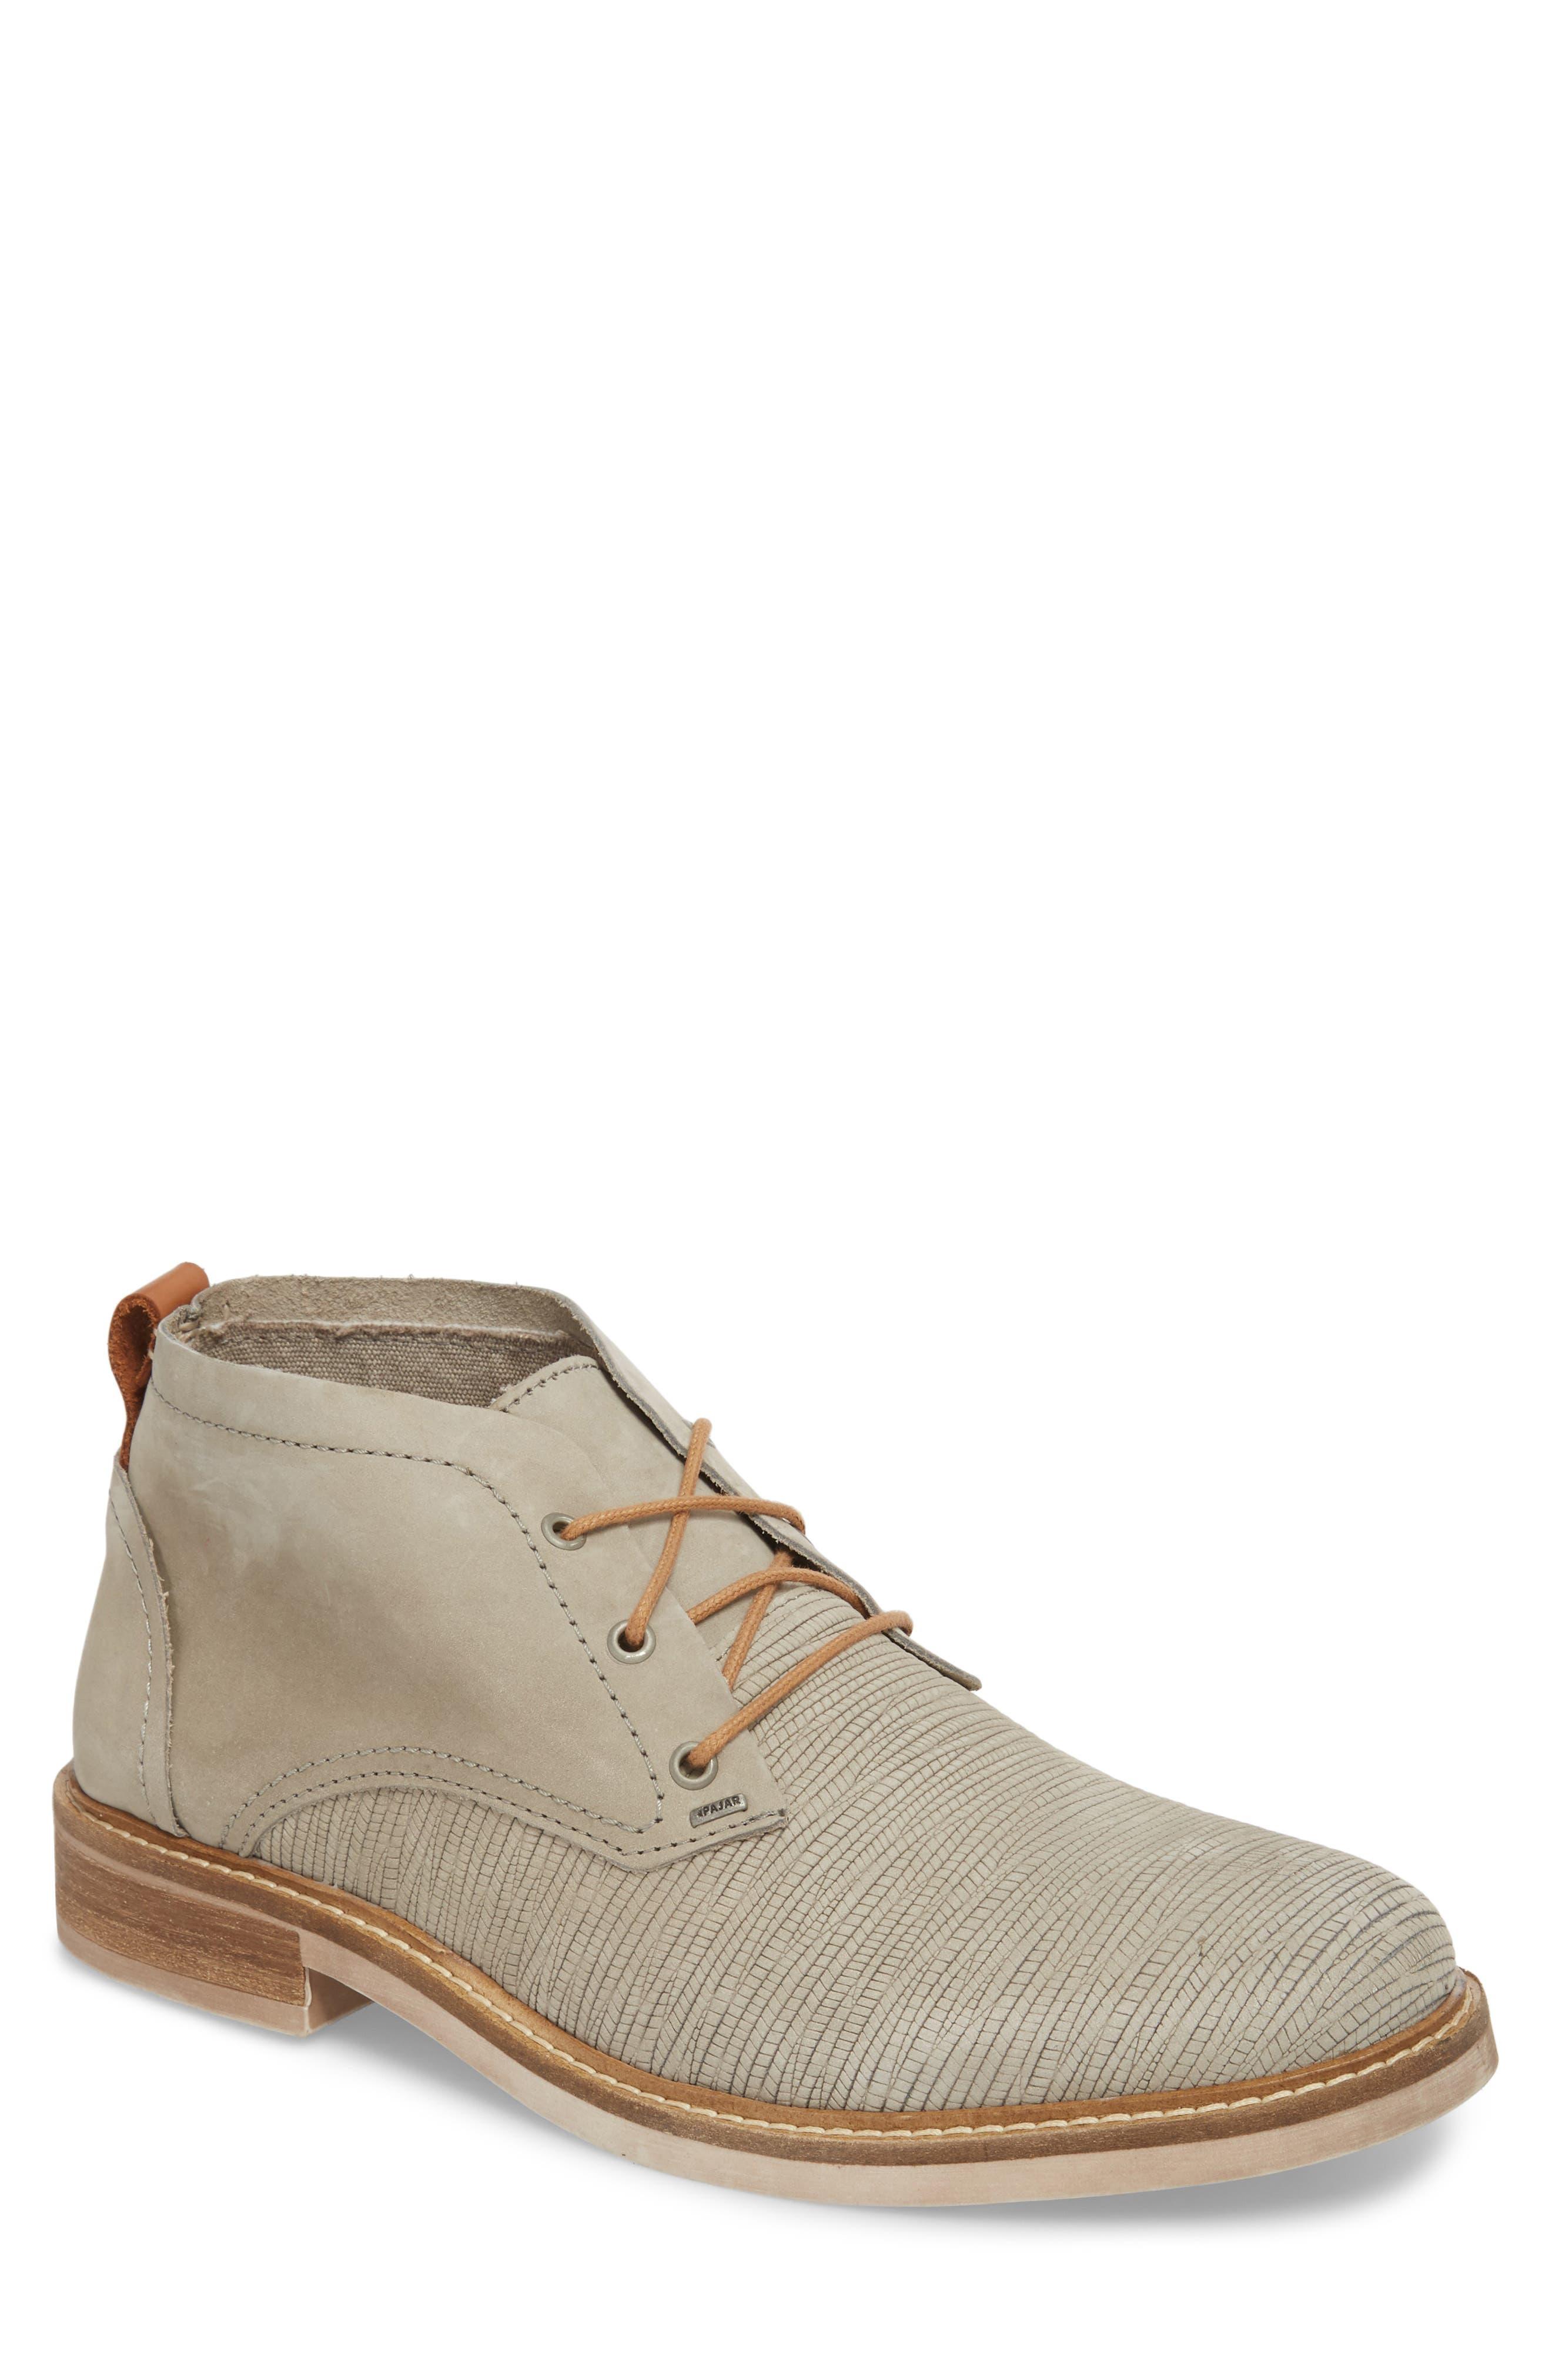 Pajar Men's Mojave Chukka Boot